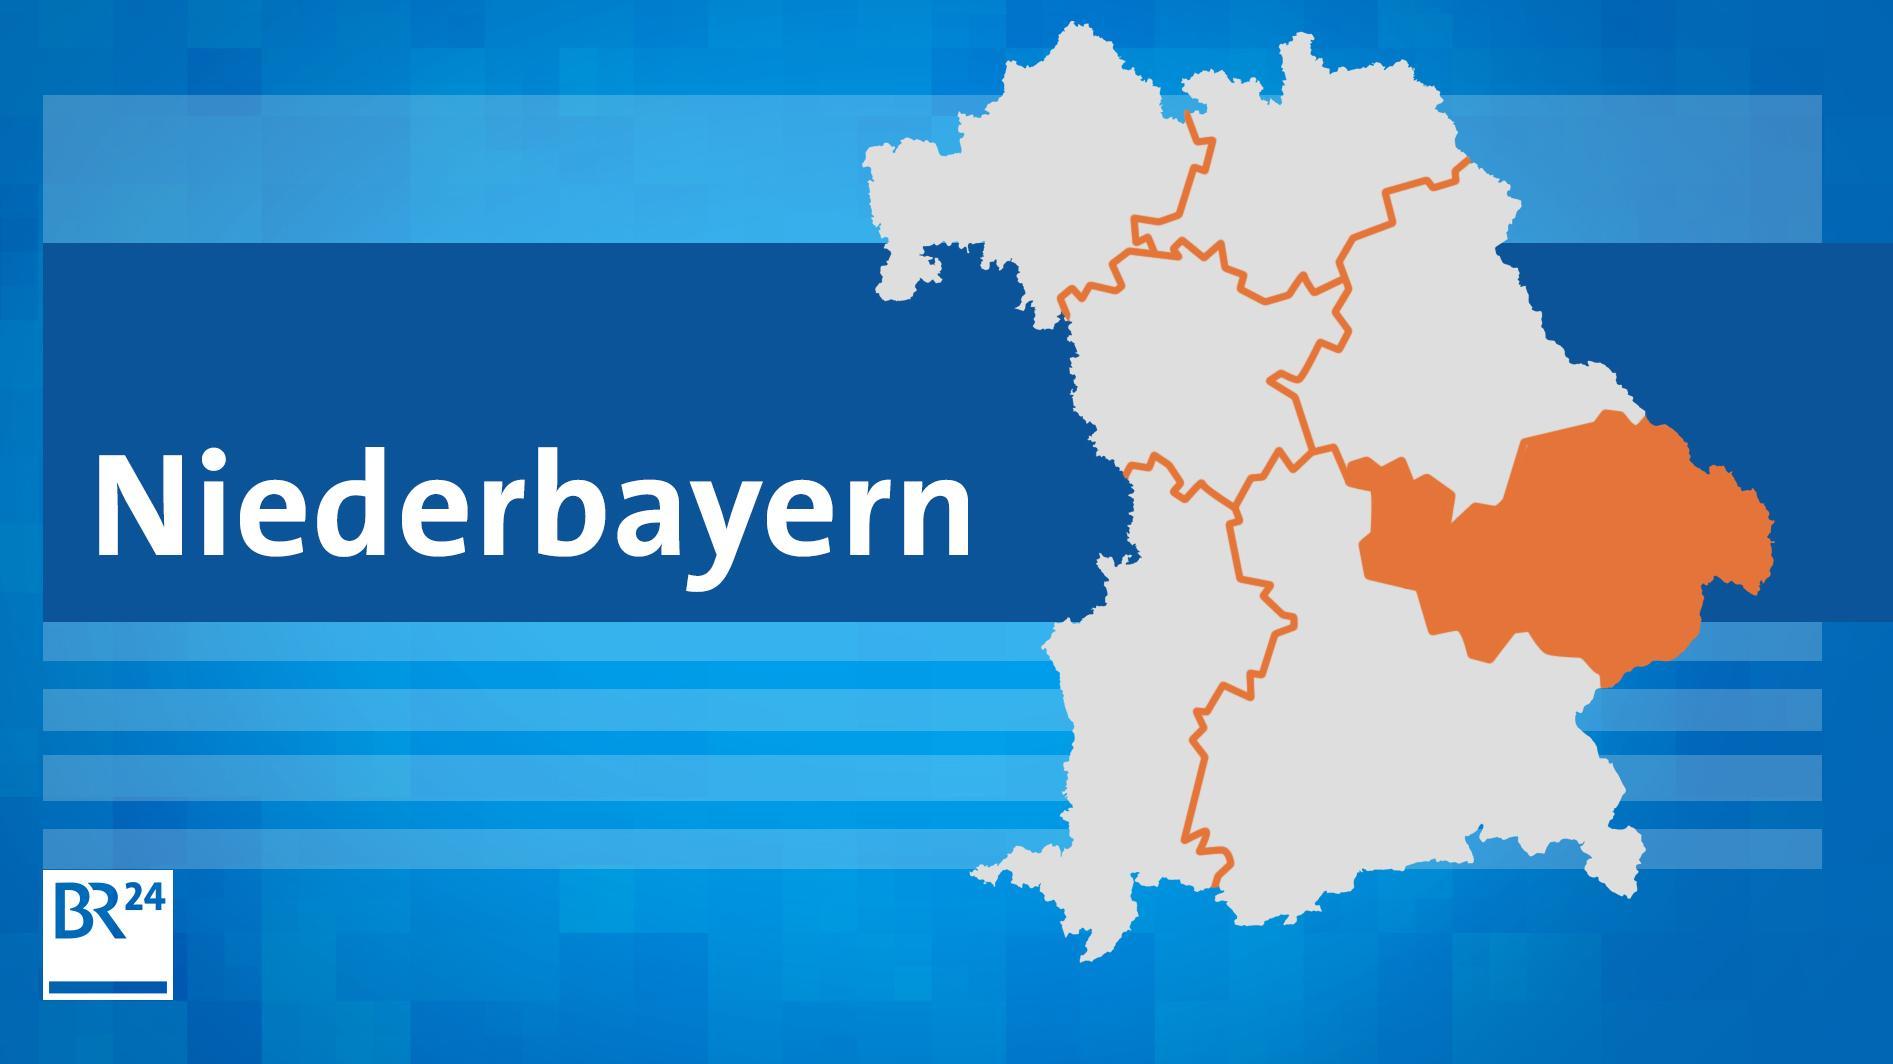 Landtagswahl in Niederbayern